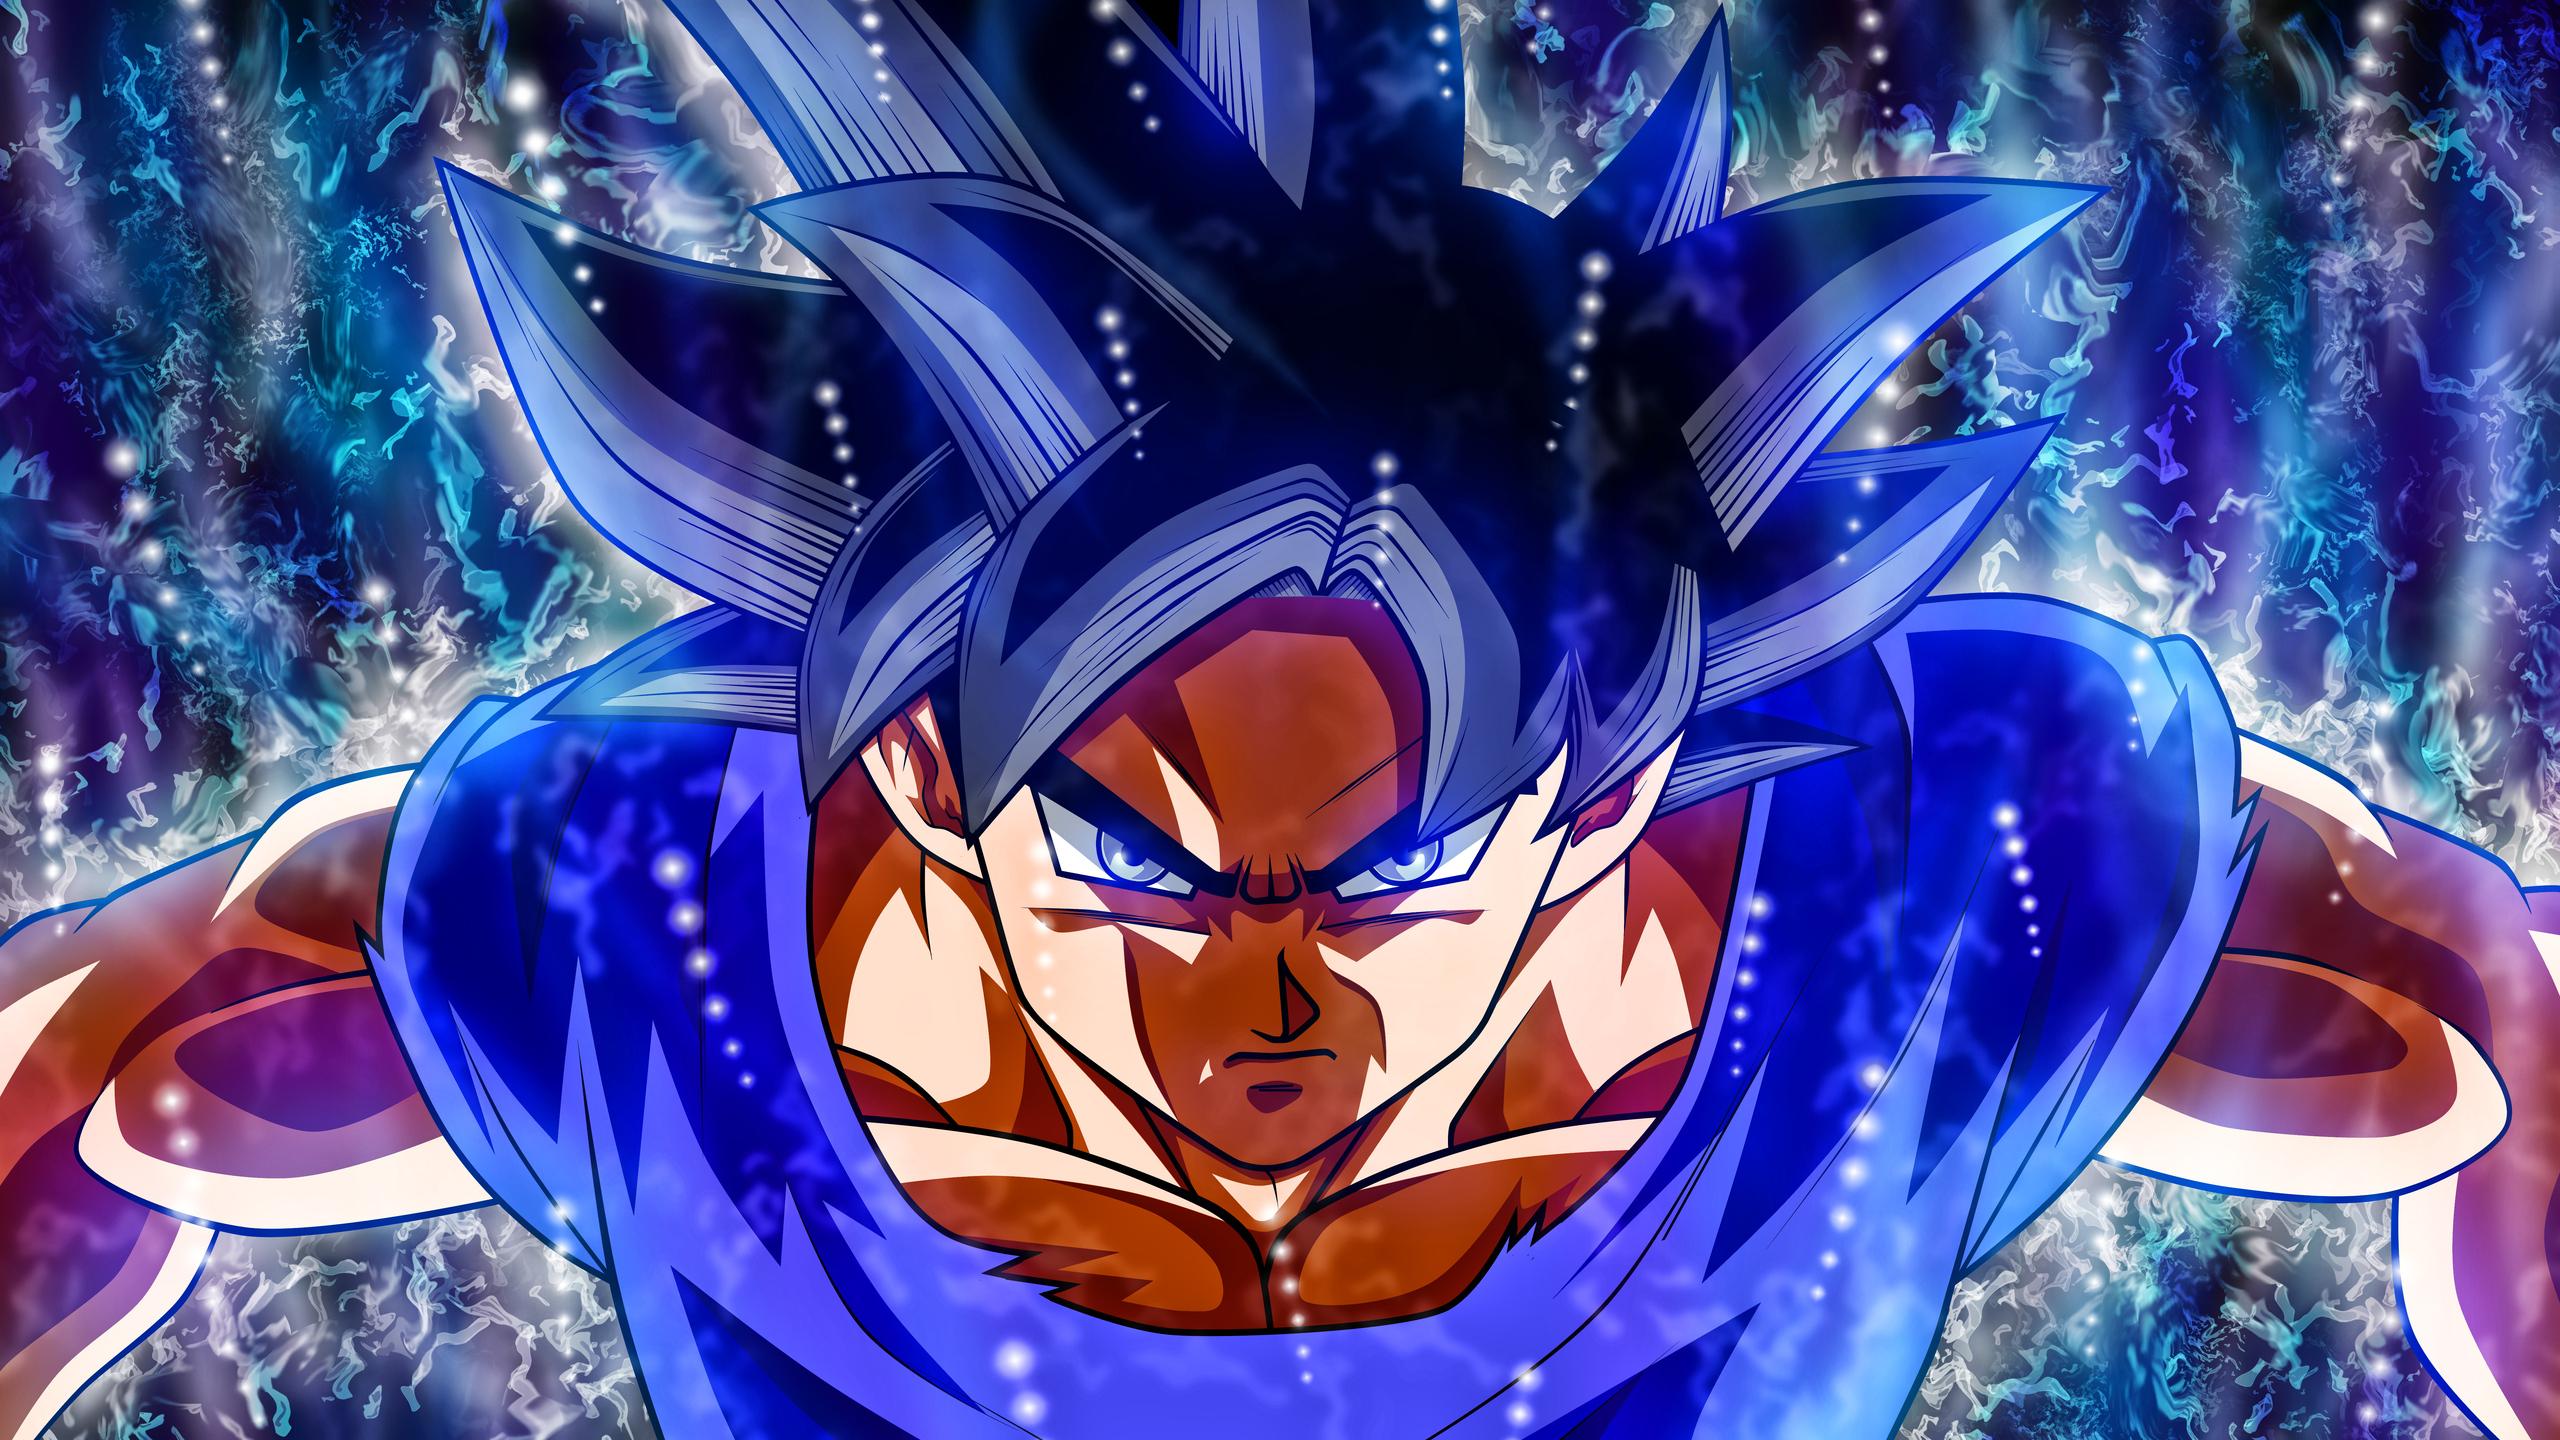 2560x1440 Goku Ultra Instinct Refresh 8k 1440P Resolution ...